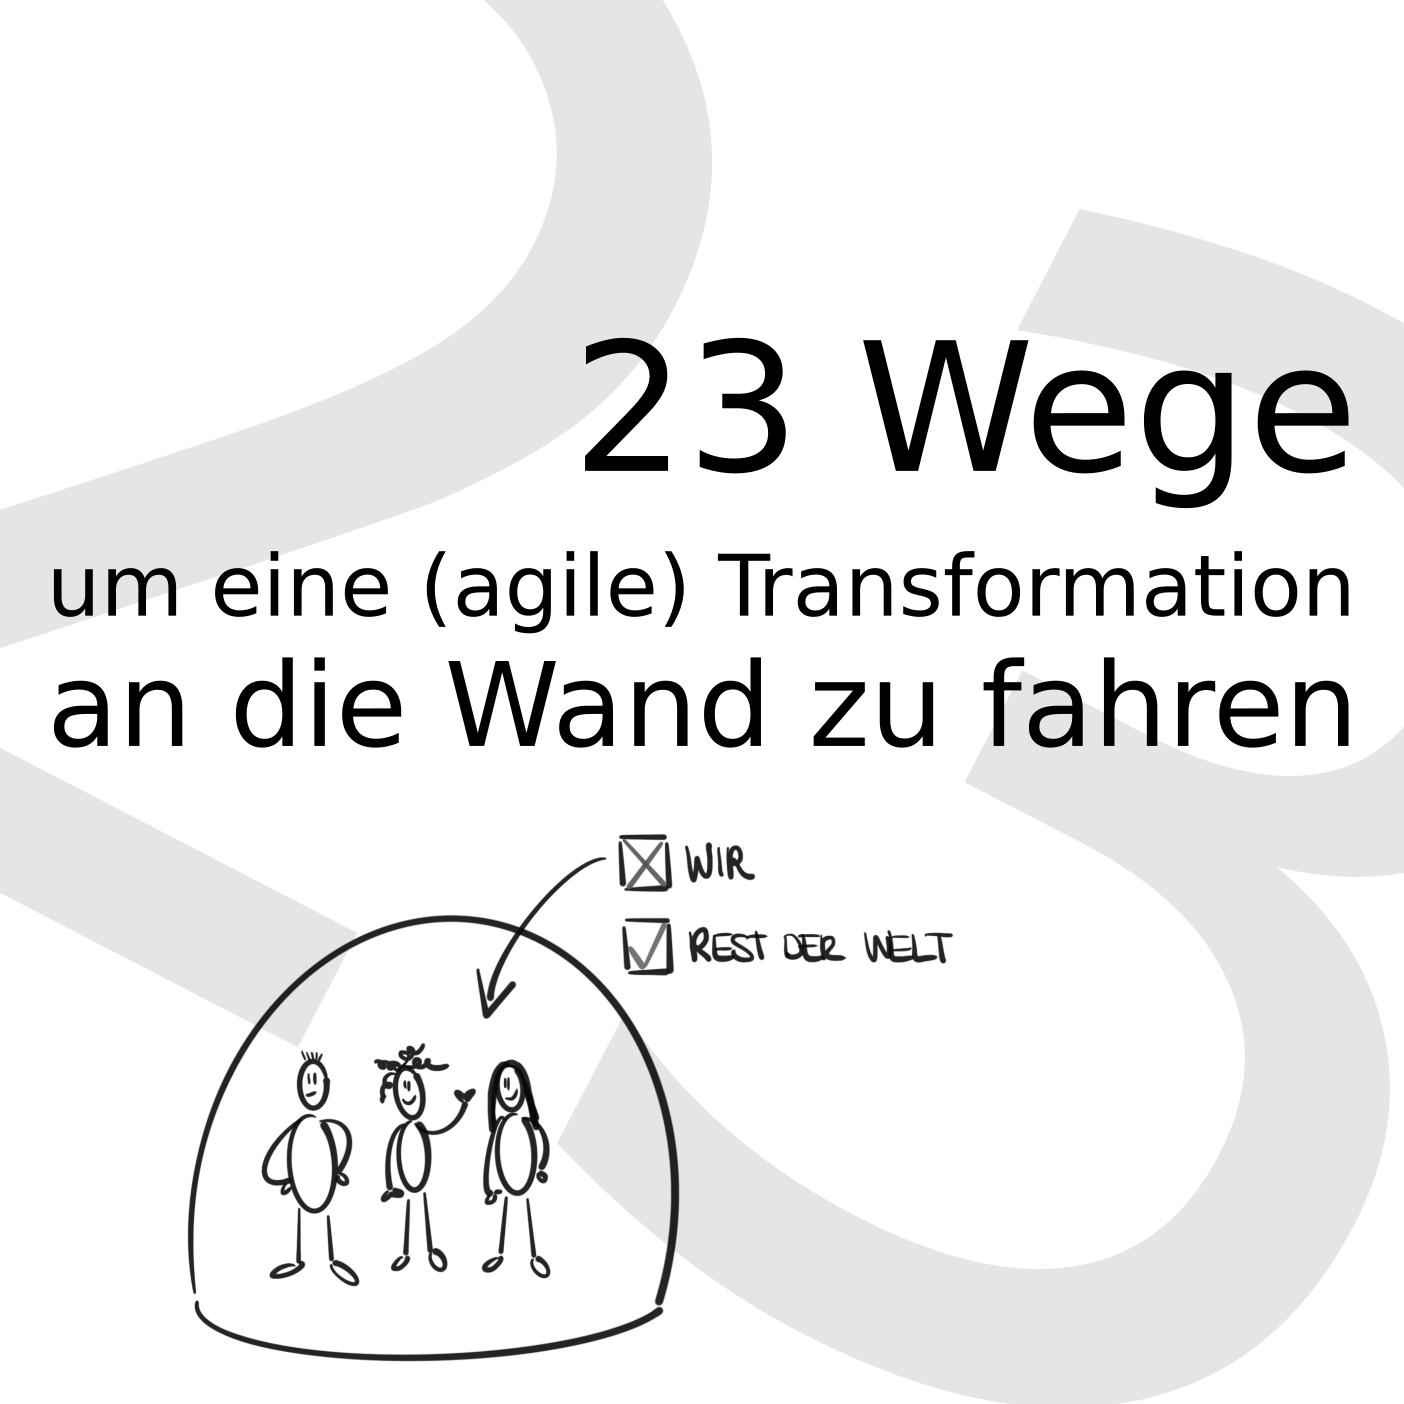 Cover - #teamagile | 23 Wege, um eine (agile) Transformation an die Wand zu fahren.